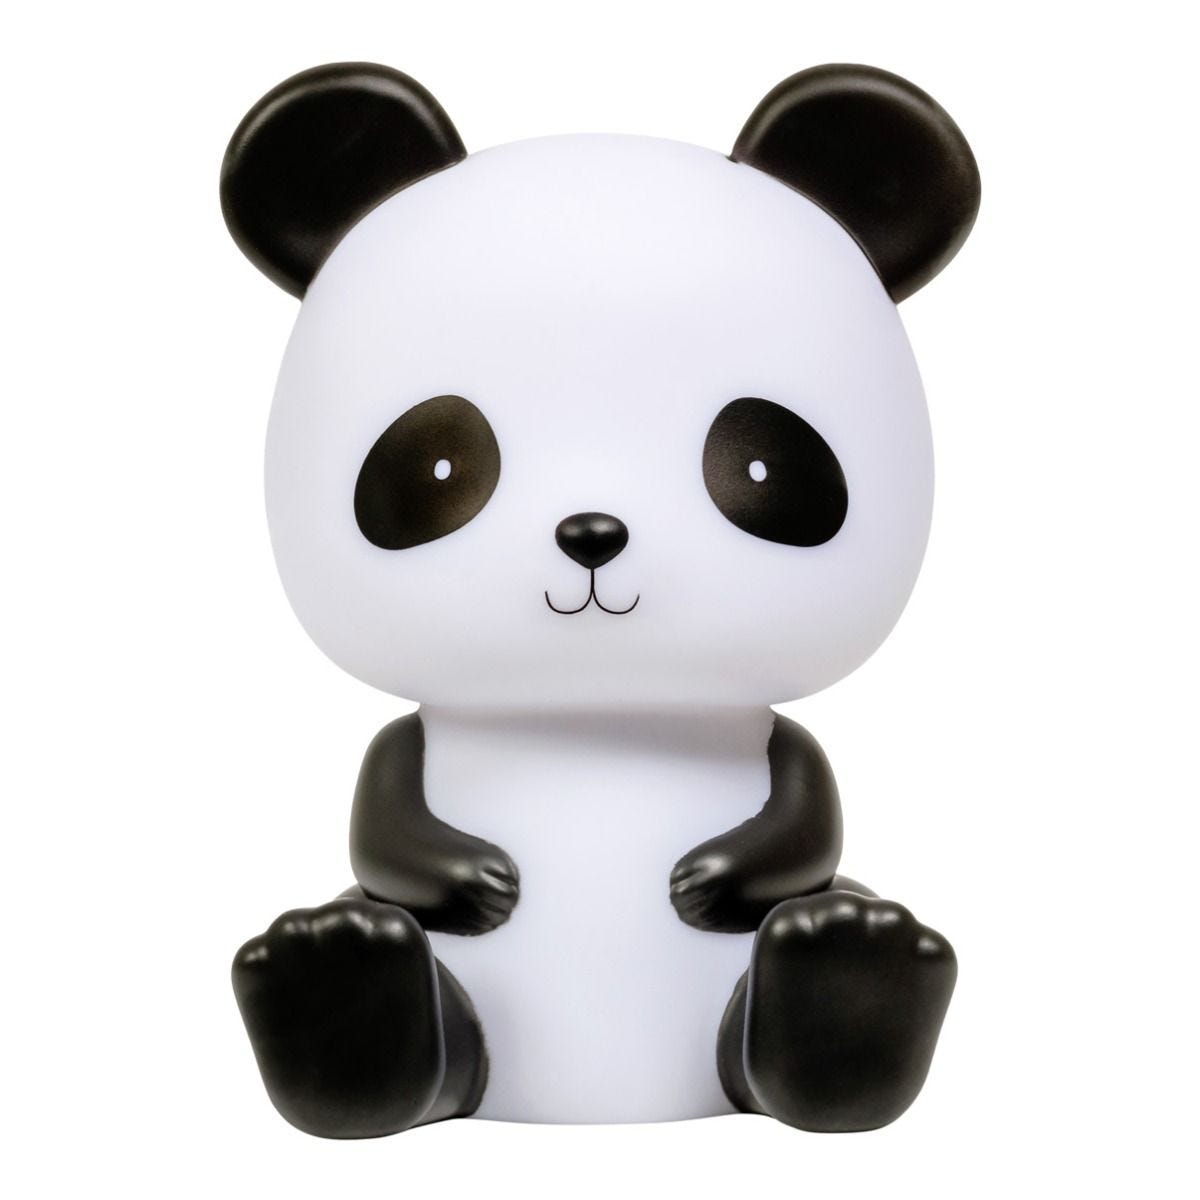 öölamp-panda